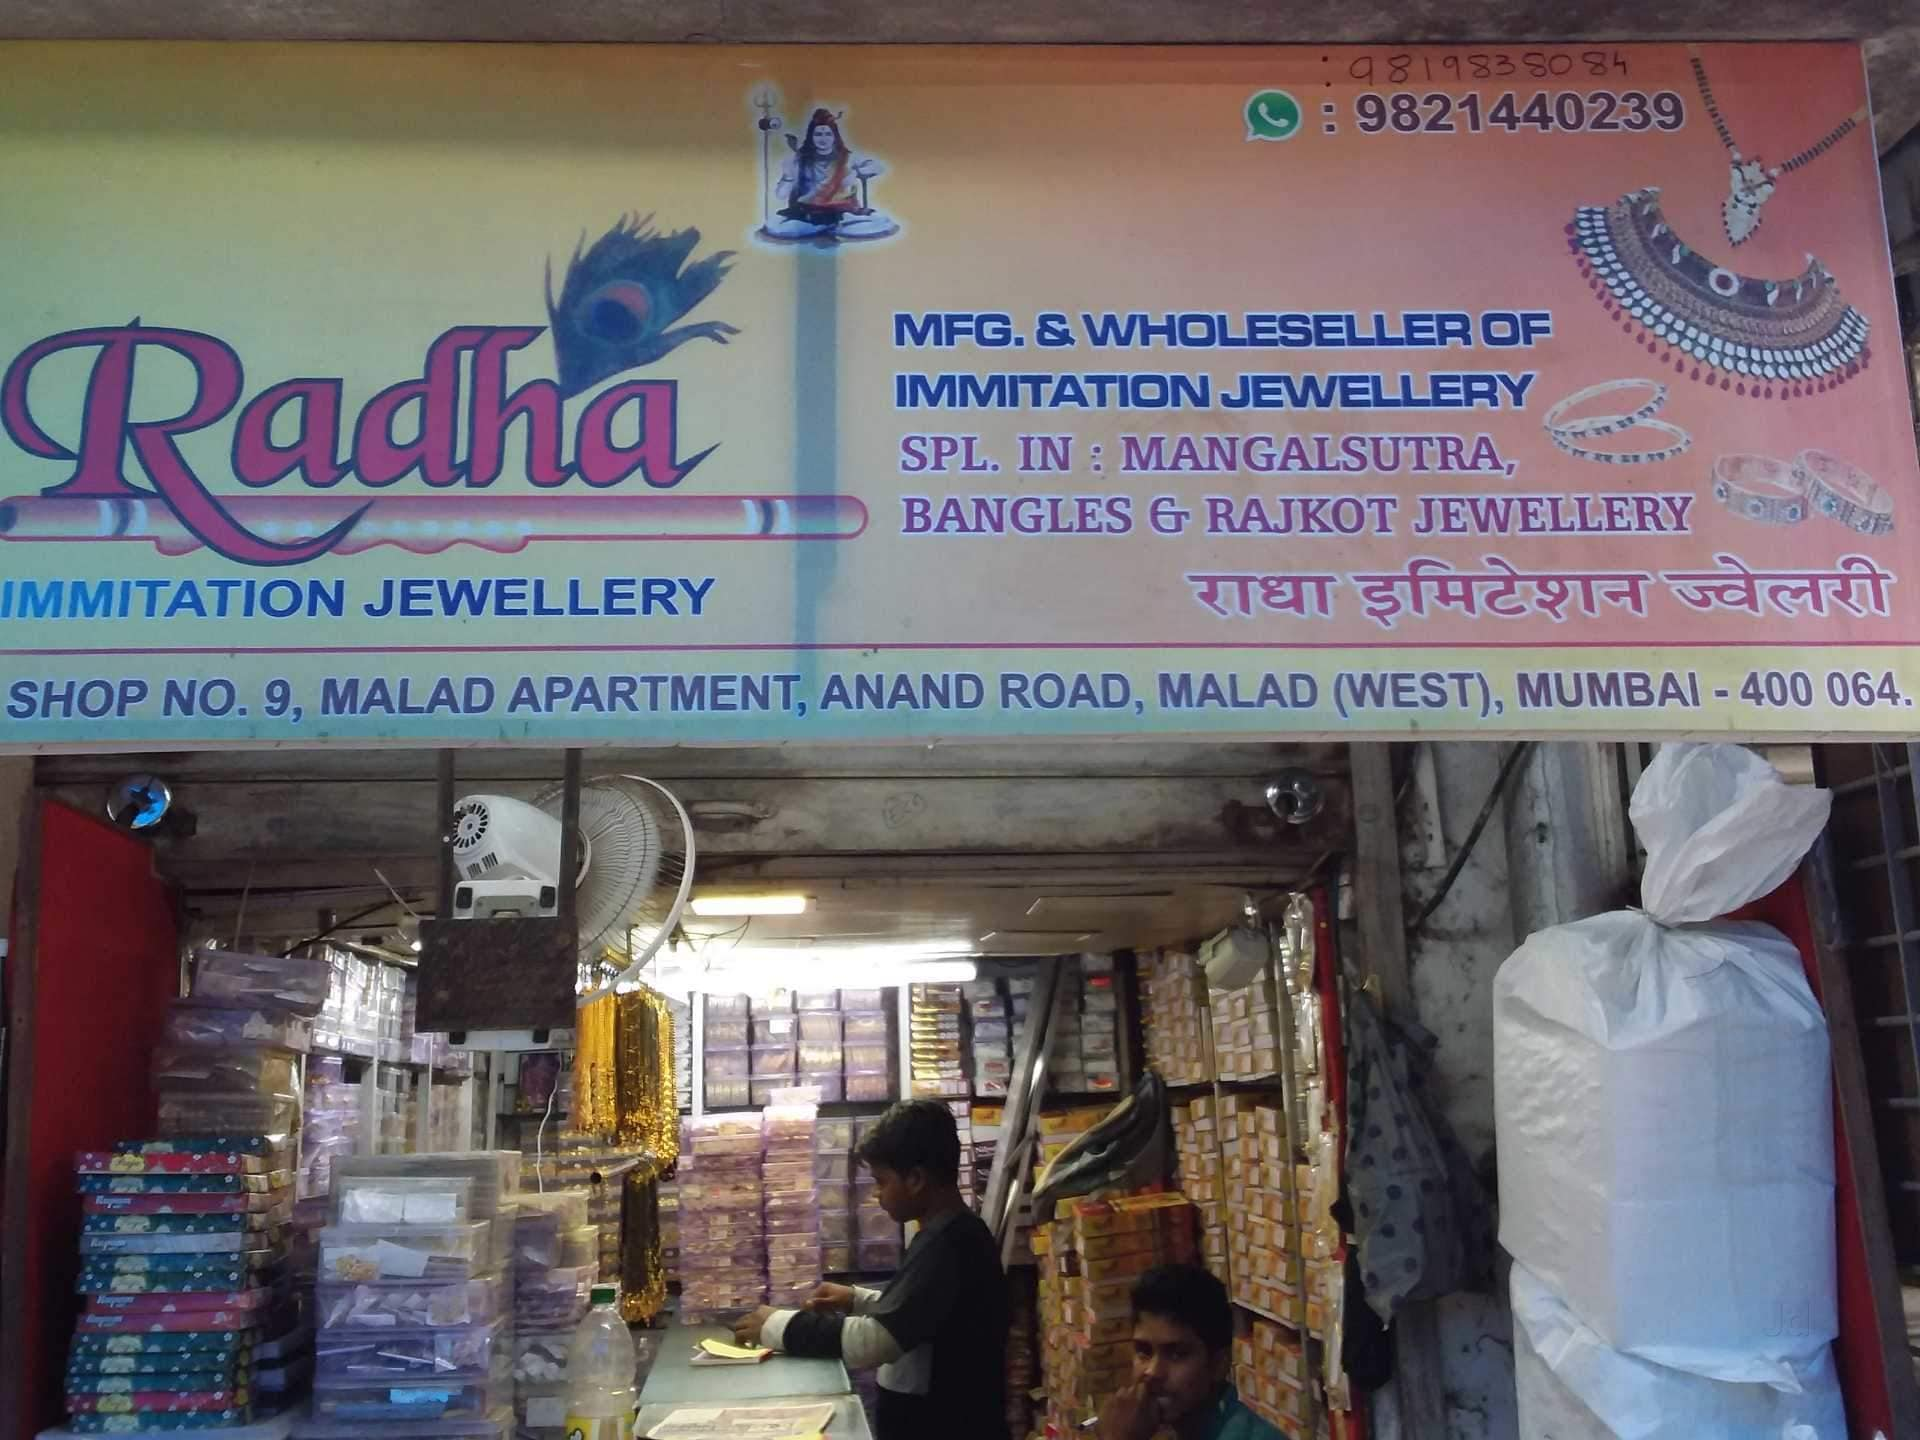 Top 100 Imitation Jewellery Wholesalers in Mumbai - Best Imitation